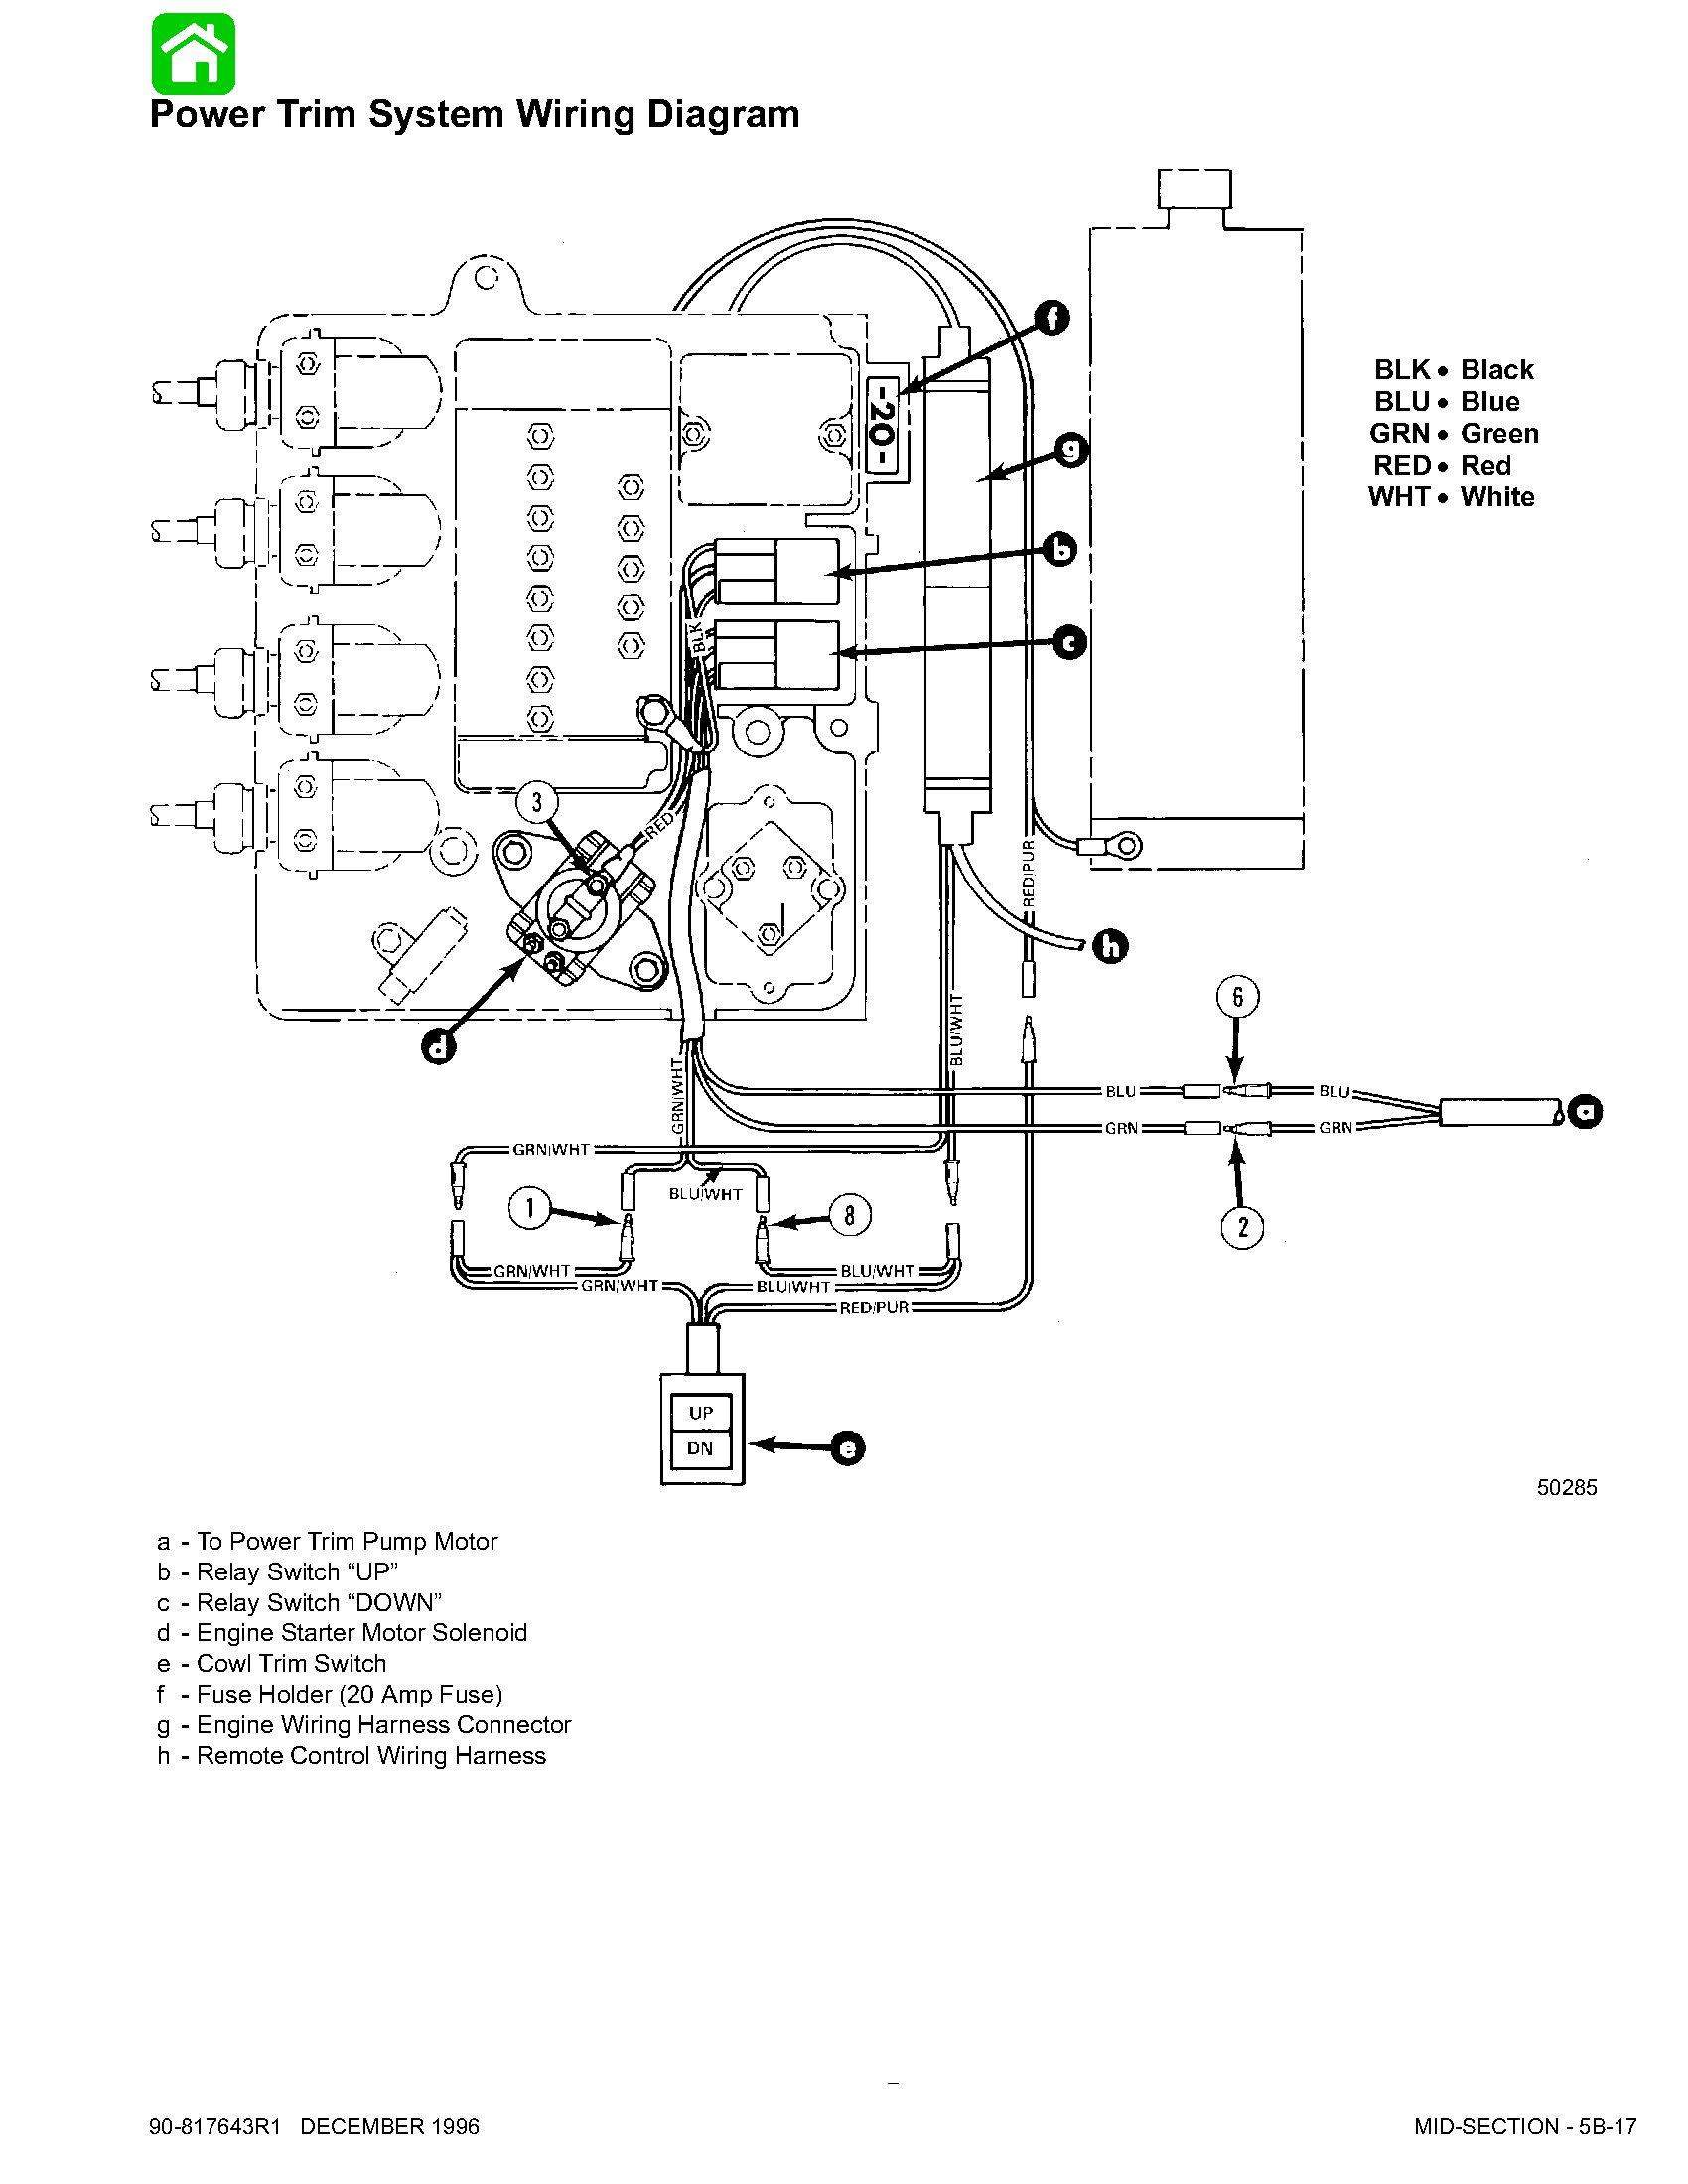 [WLLP_2054]   KM_0024] Tohatsu 90 Hp Outboard Wiring Diagram Download Diagram | Tohatsu Outboard Wiring Diagram |  | Usly Majo Tool Mohammedshrine Librar Wiring 101